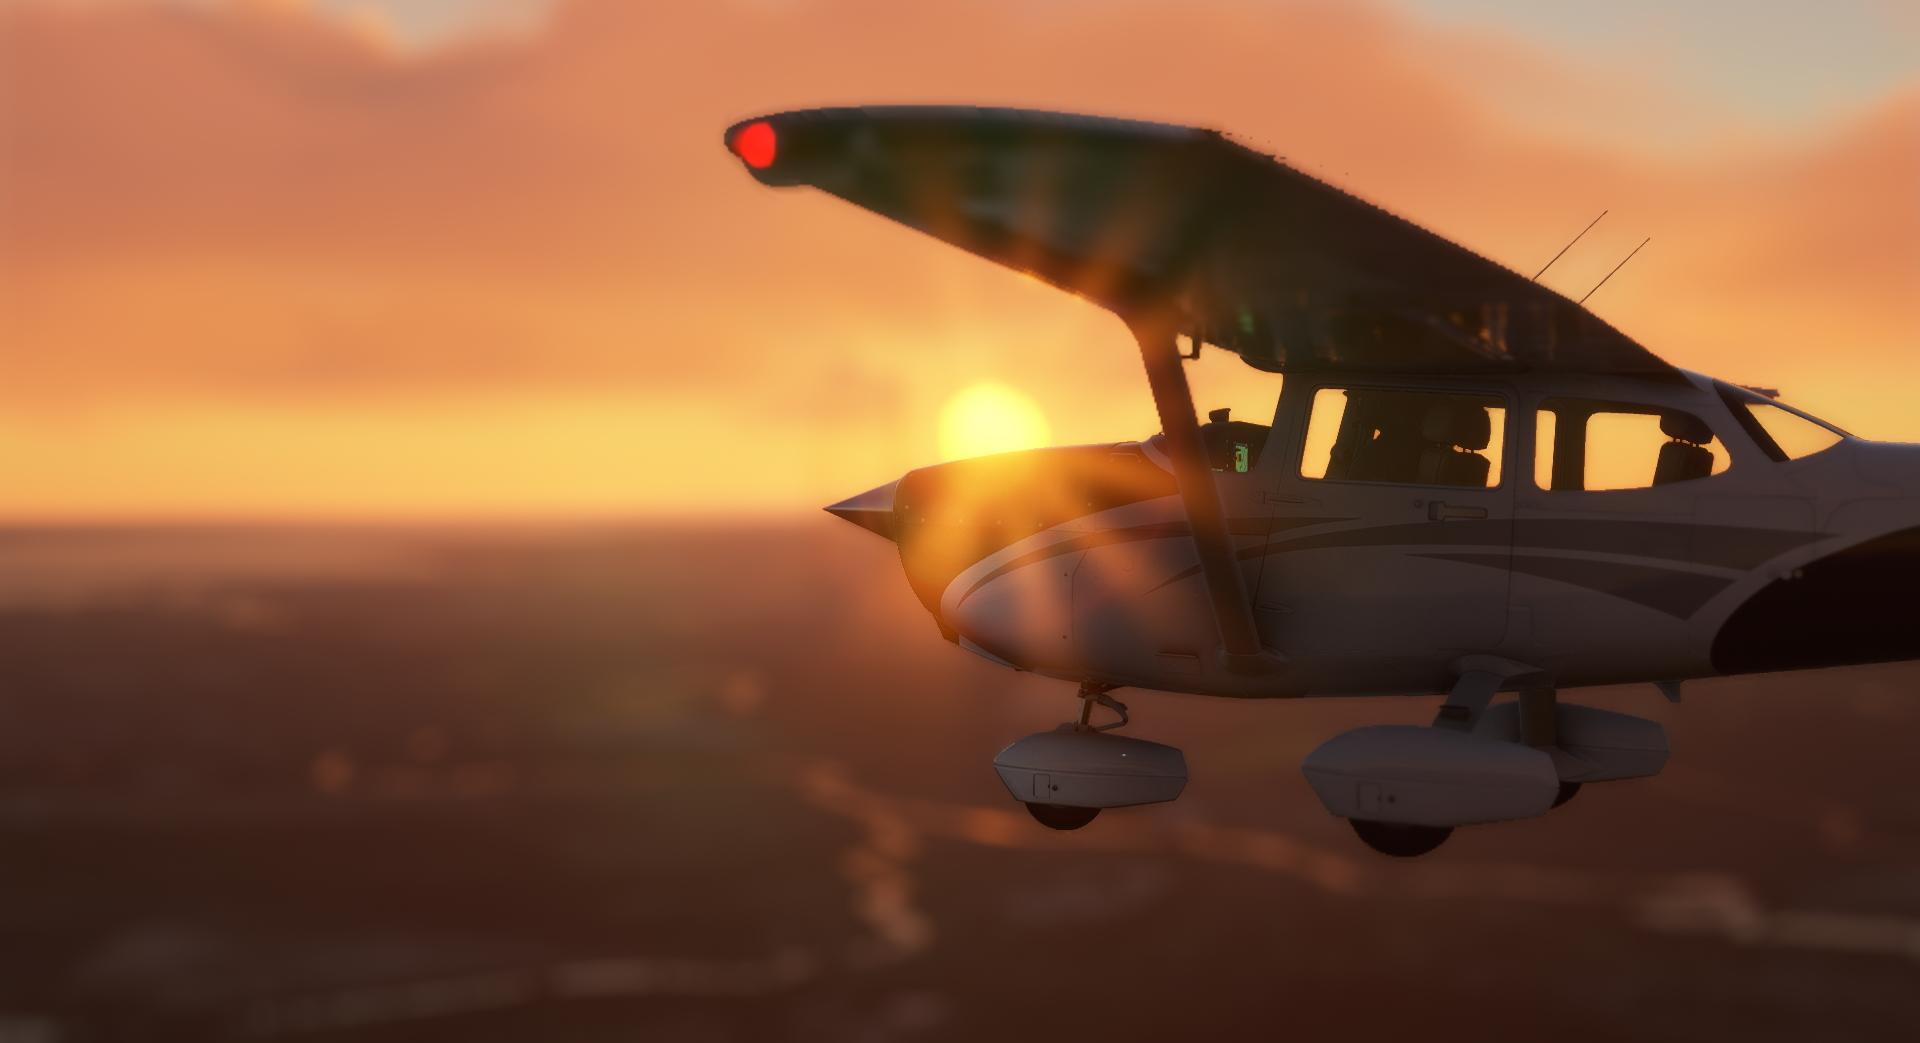 how-bad-is-microsoft-flight-simulator's-development-turbulence?